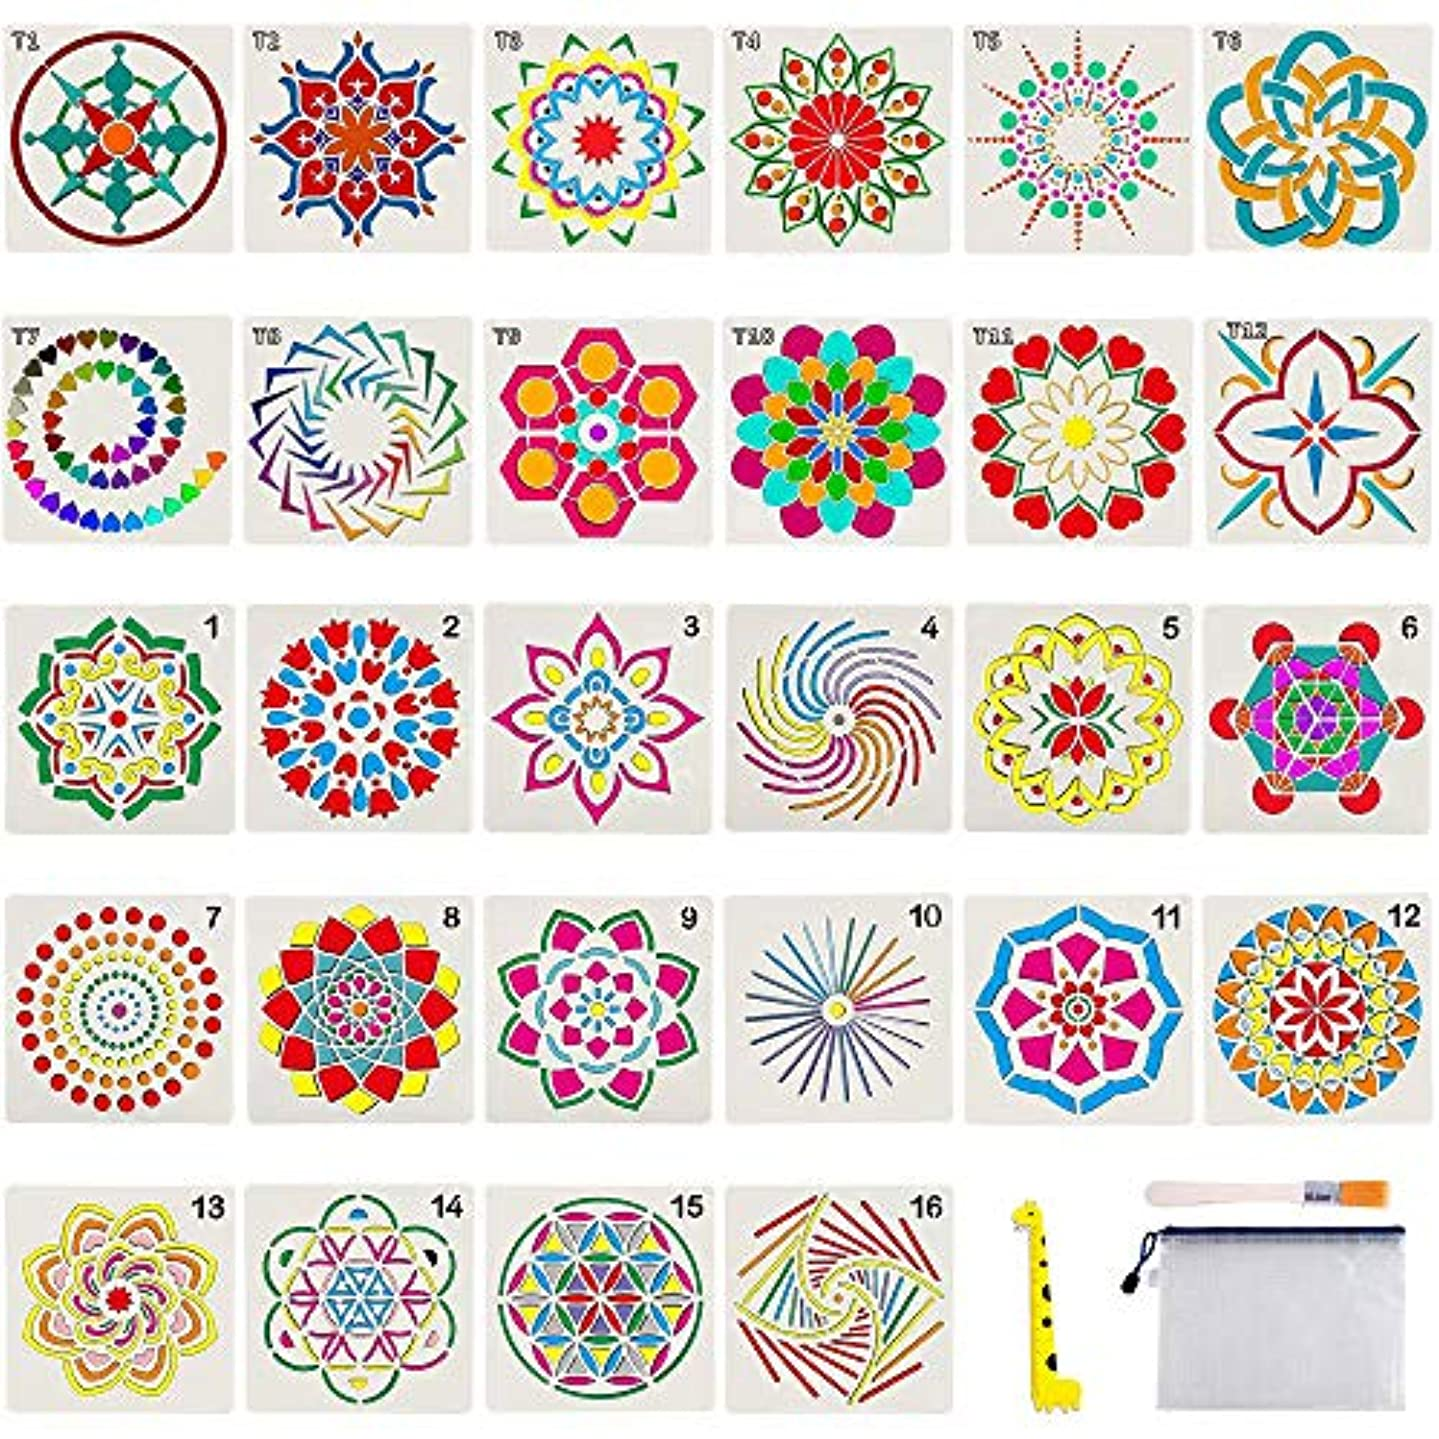 28 Pack Mandala Stencils - Mandala Template for Painting, Reusable Stencils Art for Painting Mandala Flower on Wood, Airbrush and Walls + Storage Bag/Art Brush/Ruler